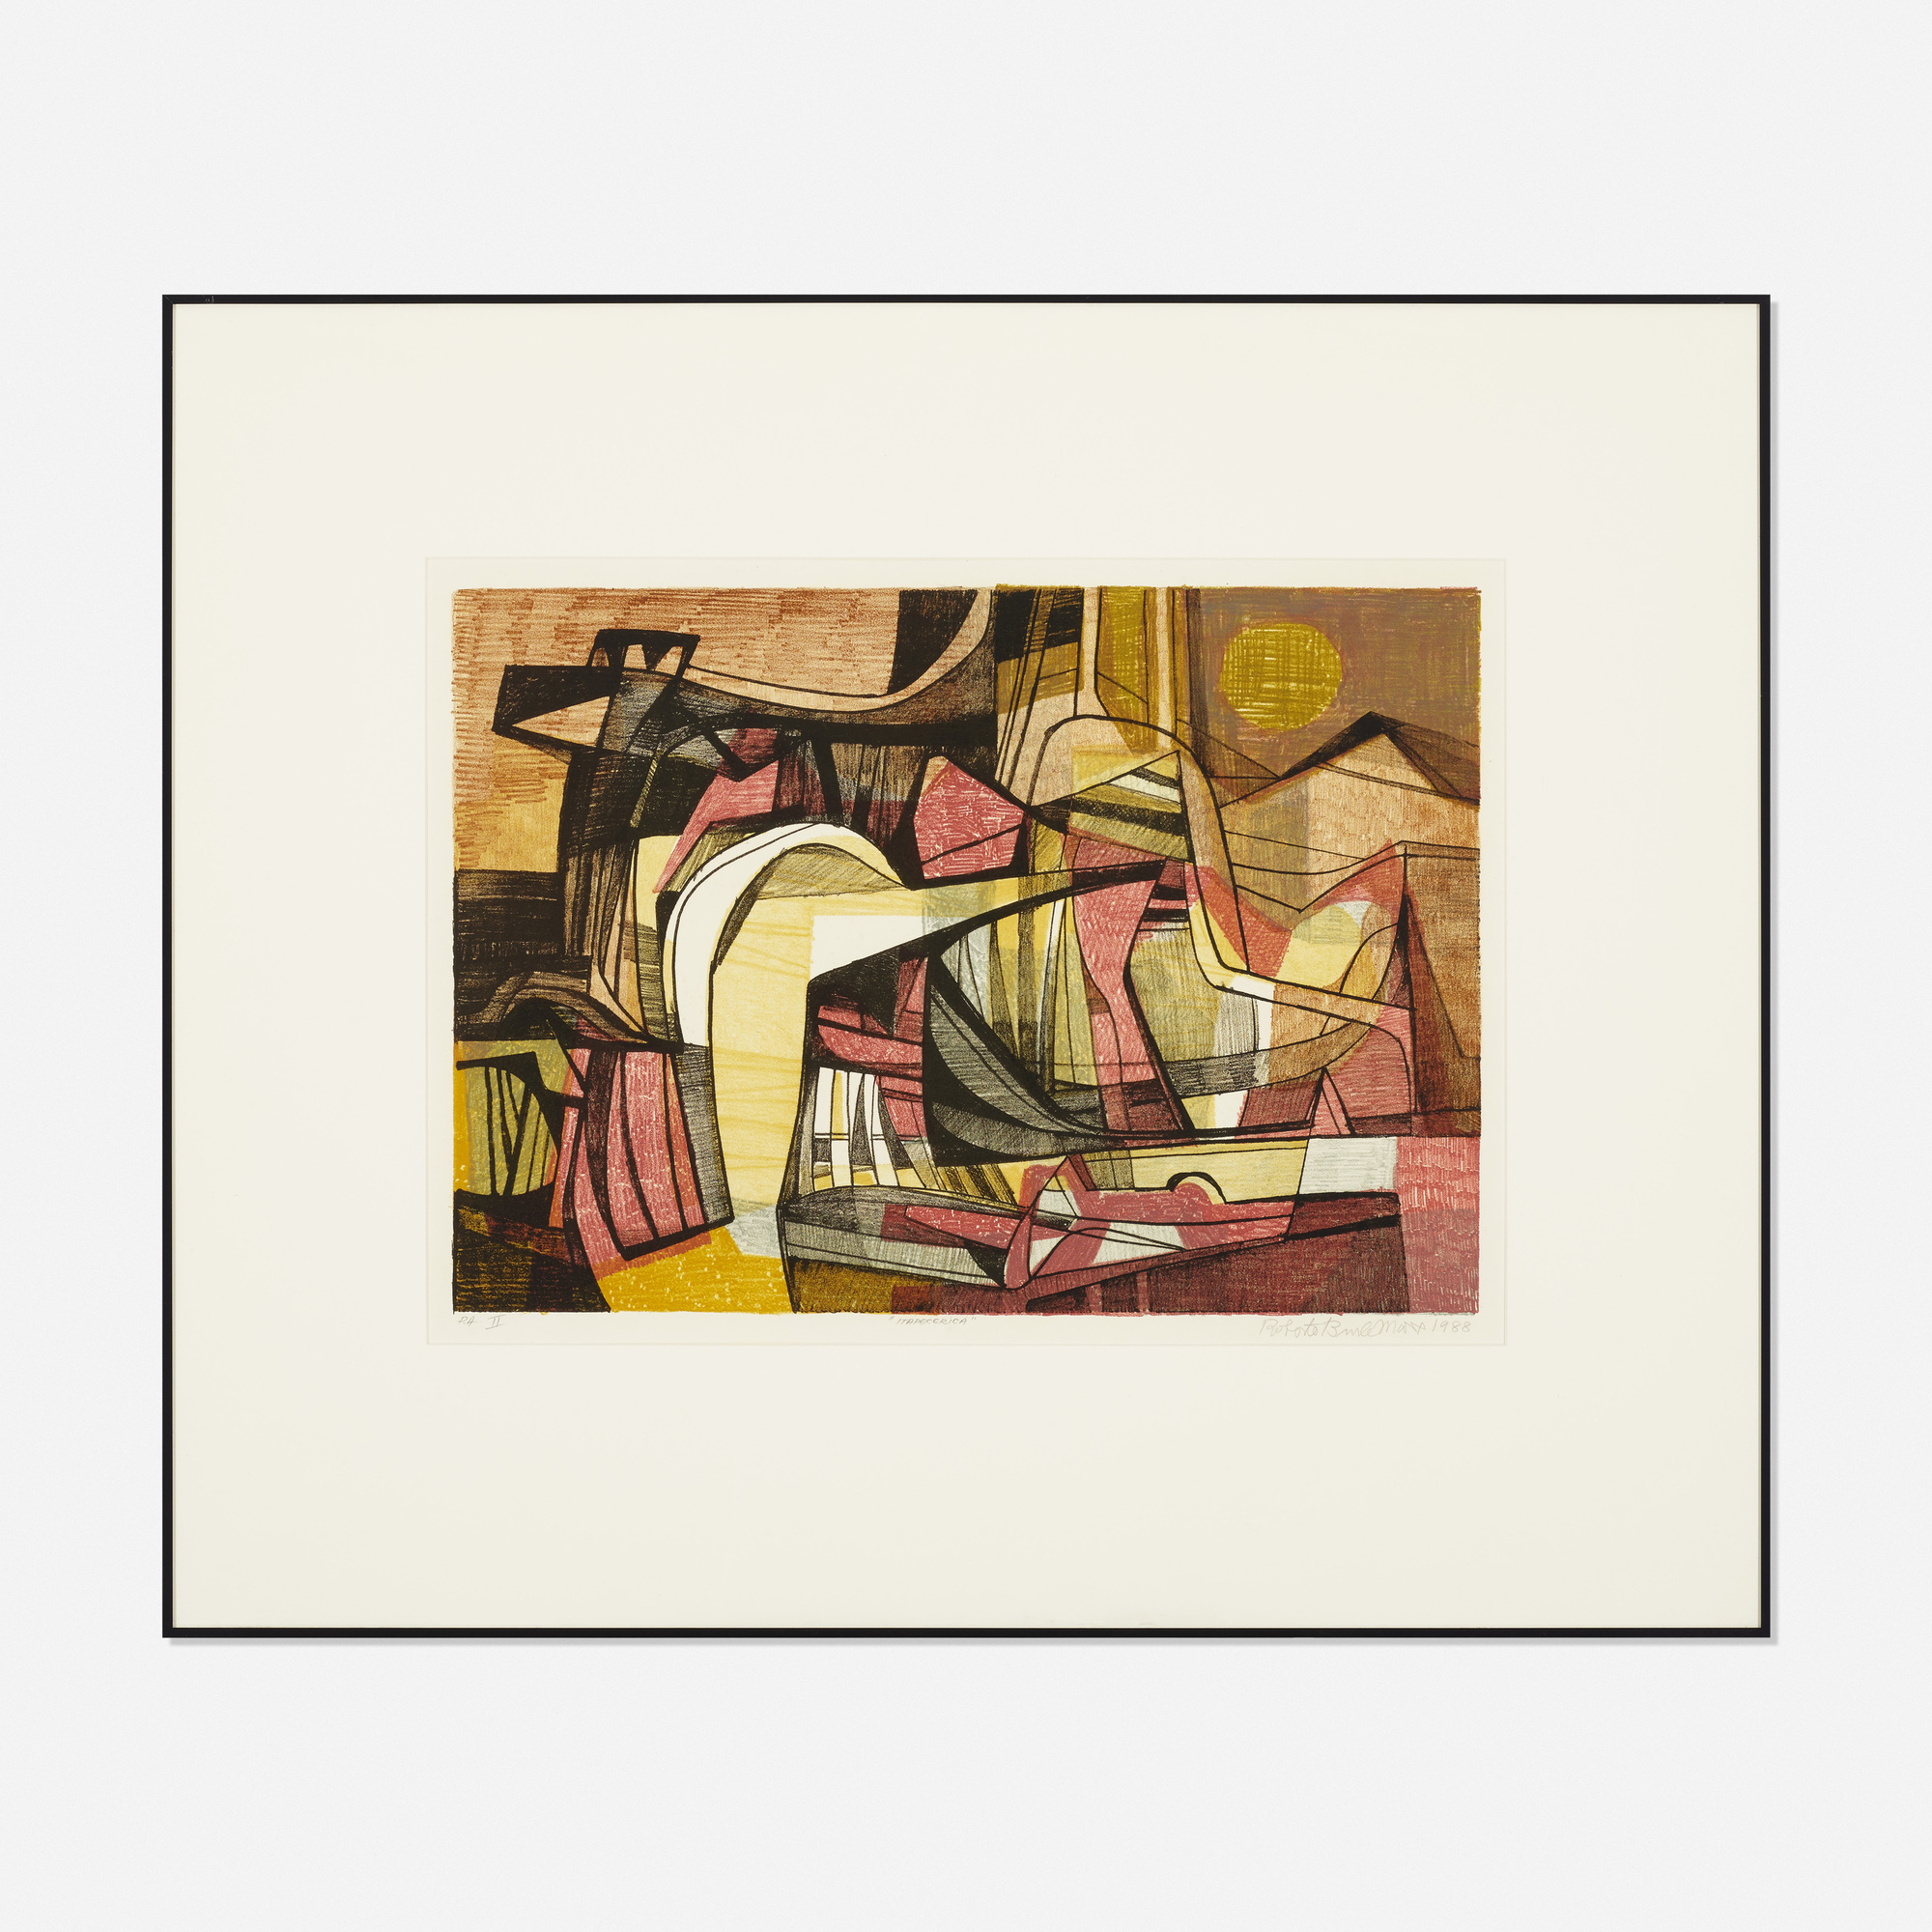 219: Roberto Burle Marx / Itapecerica (1 of 1)